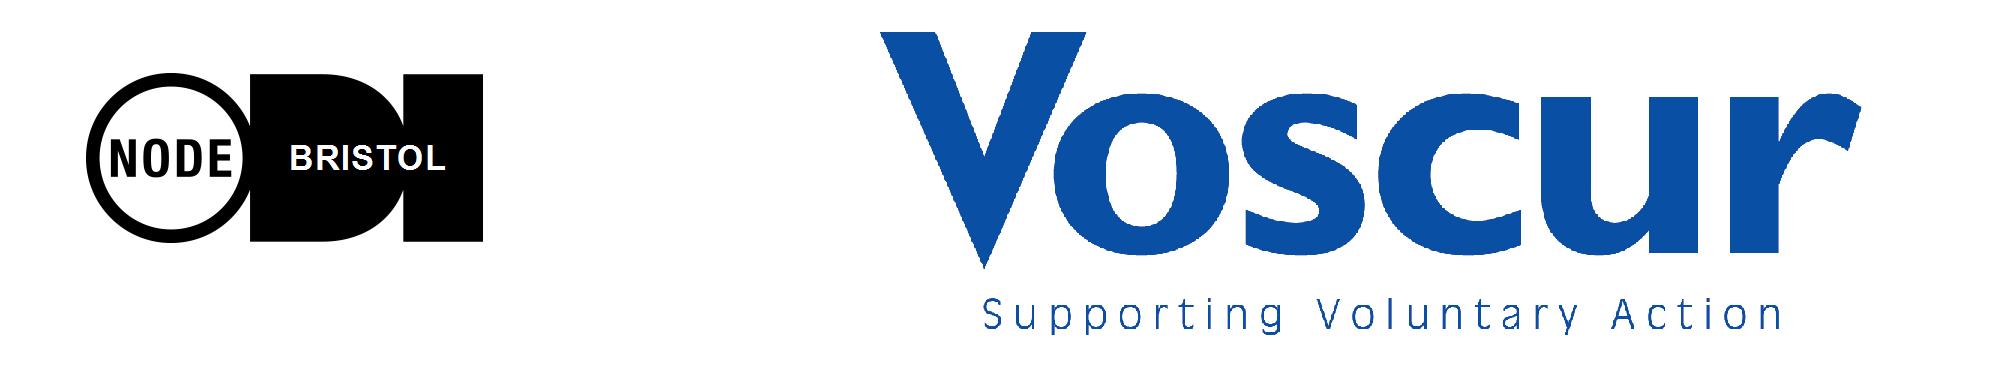 ODI Bristol and Voscur logos